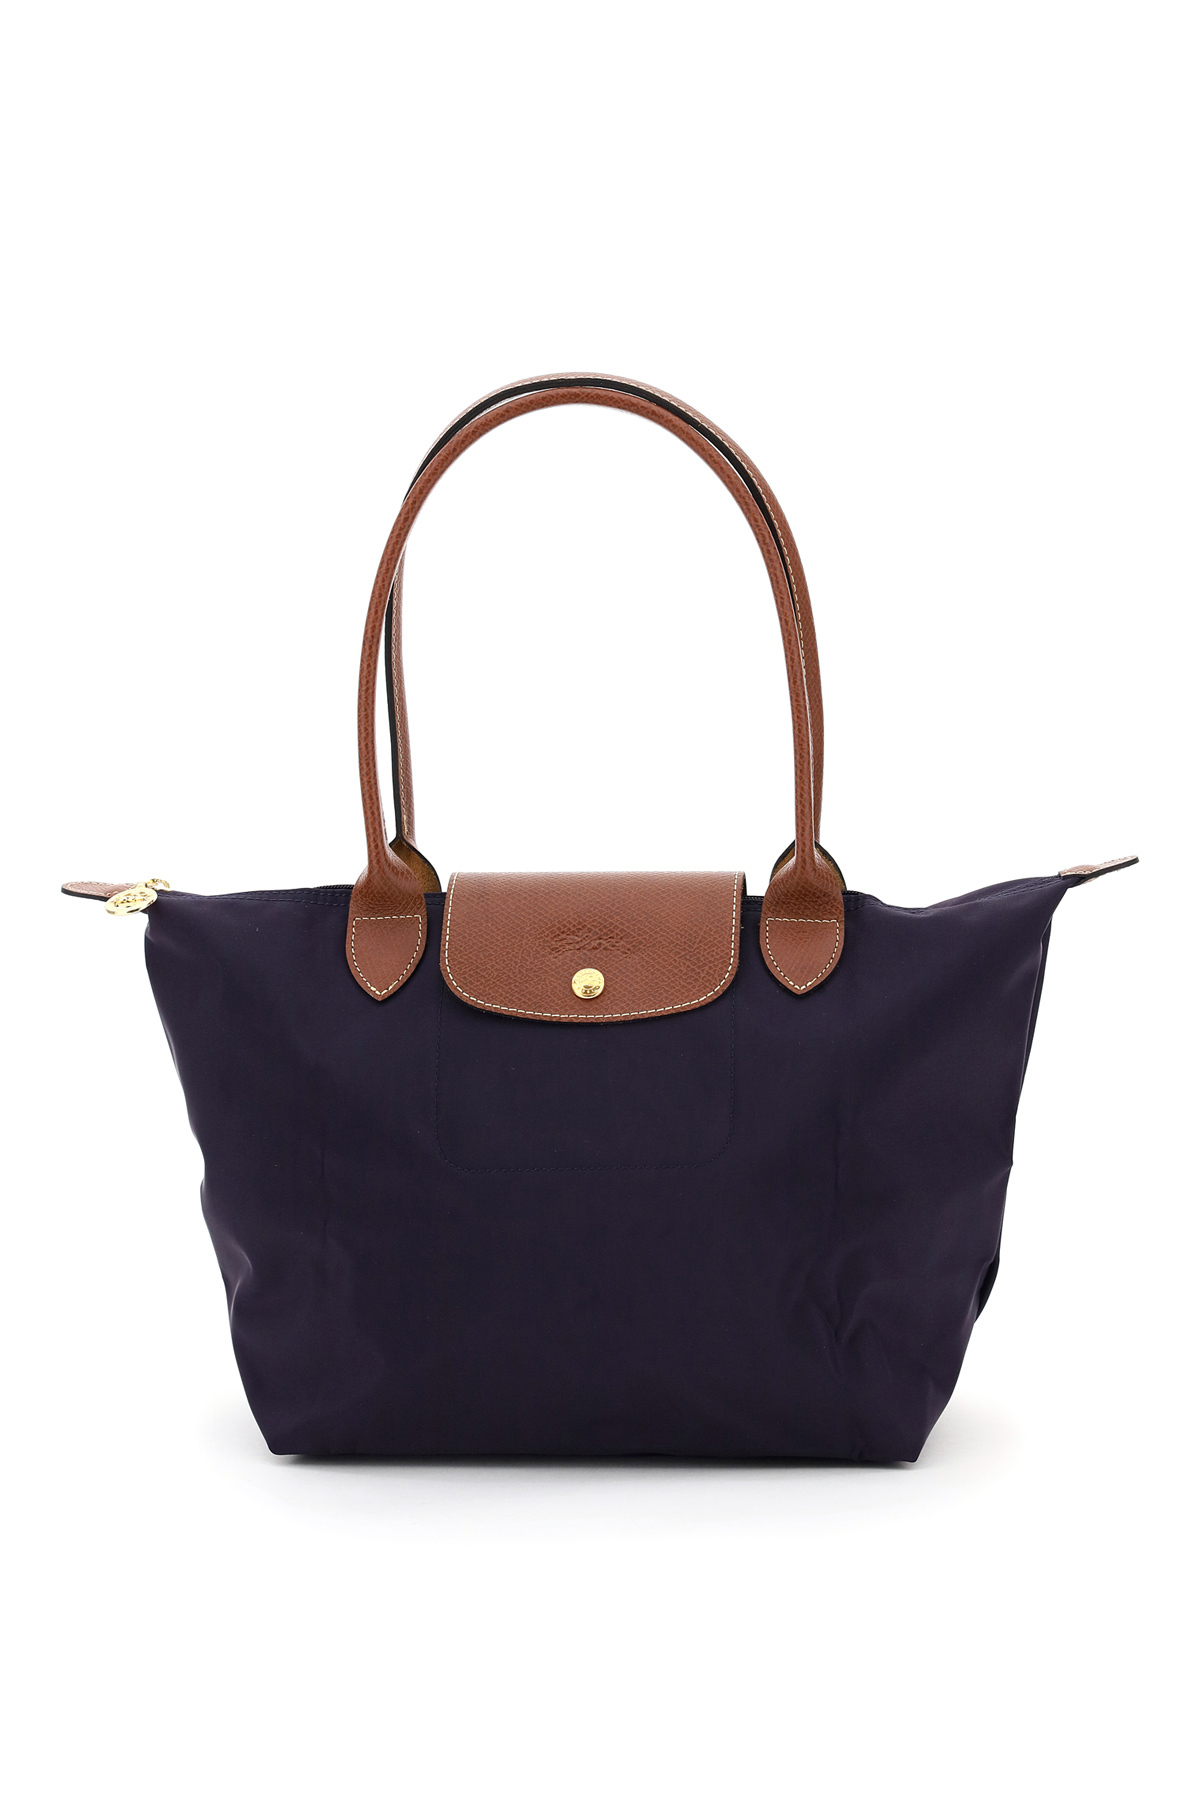 Longchamp shopping le pliage small